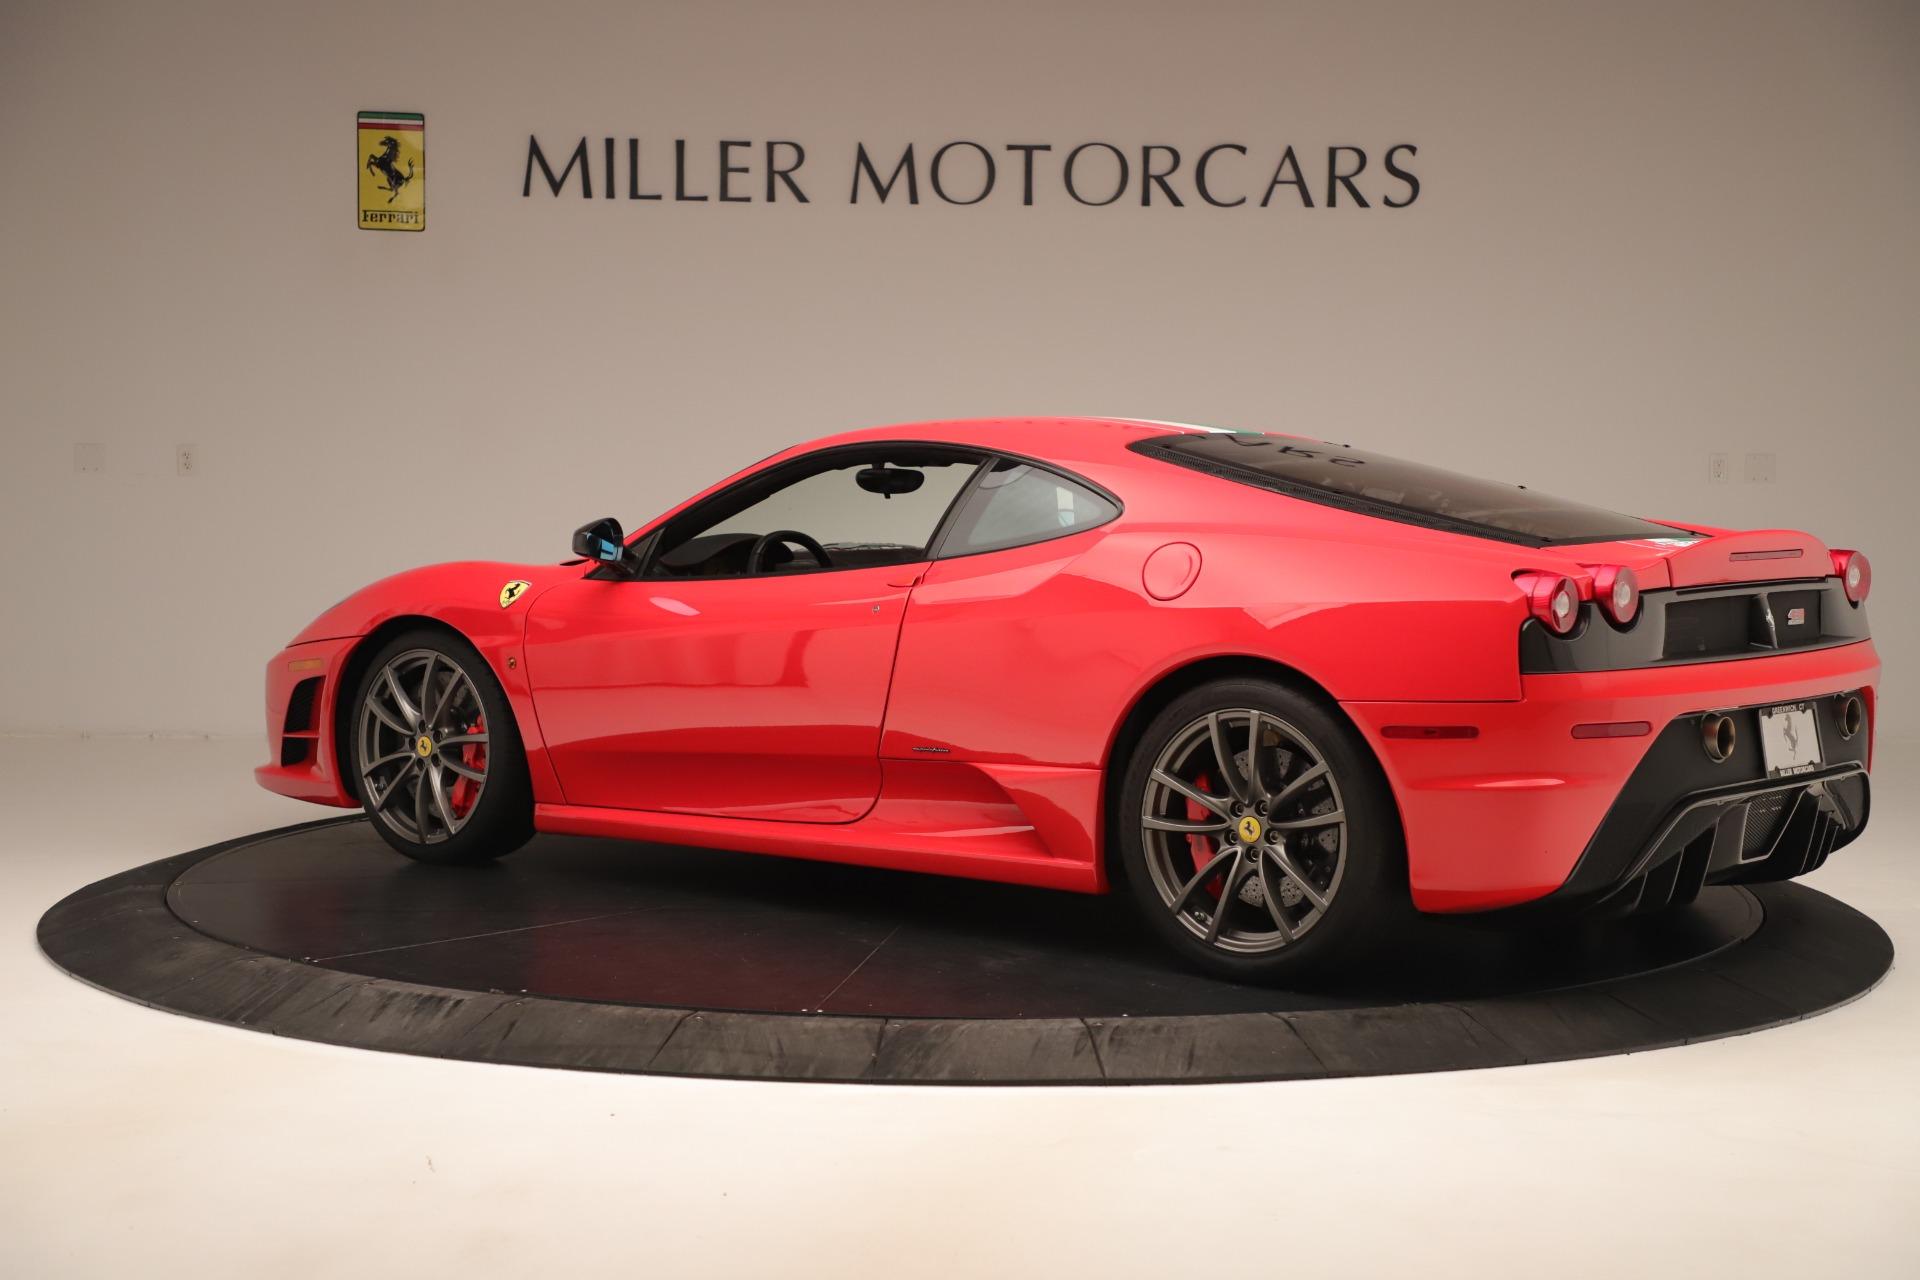 Pre Owned 2008 Ferrari F430 Scuderia For Sale 229 900 Miller Motorcars Stock 4599